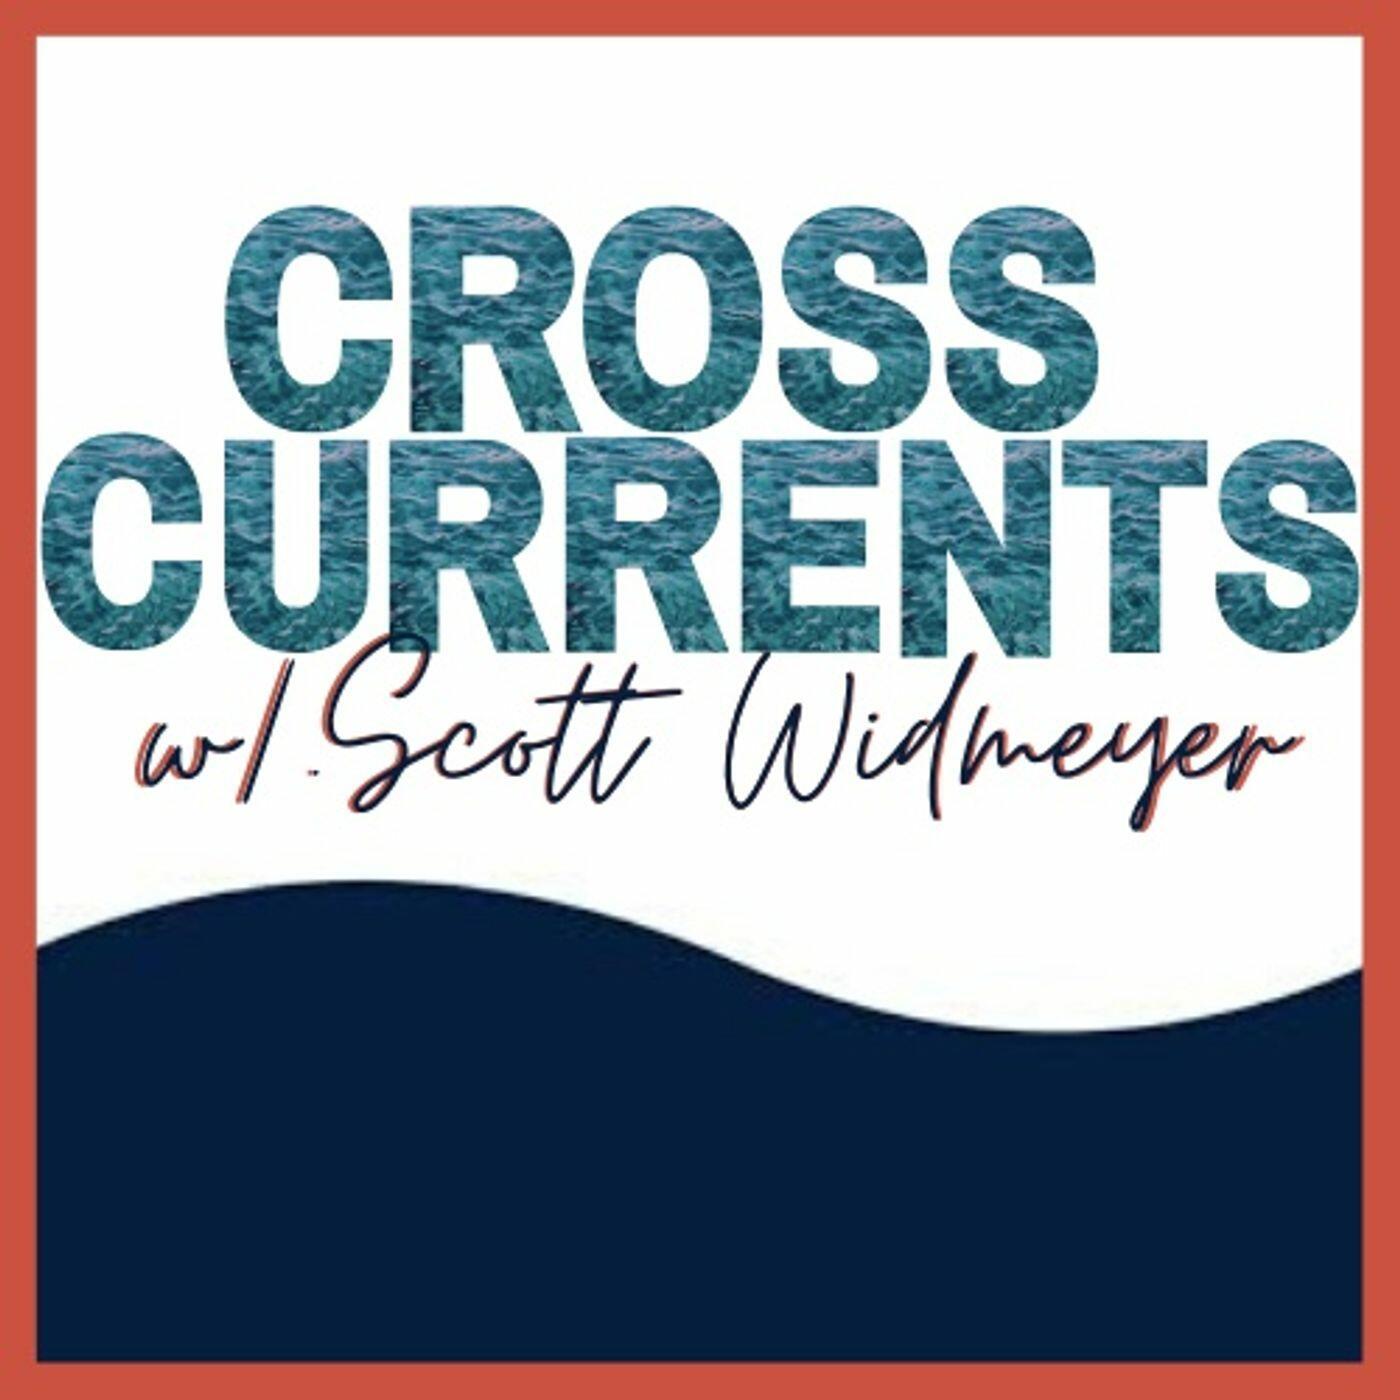 Listen to AFT's Weingarten: Teacher Activism, Public Support--'Hope in Darkness' | Cross Currents with Scott Widmeyer | Podcasts